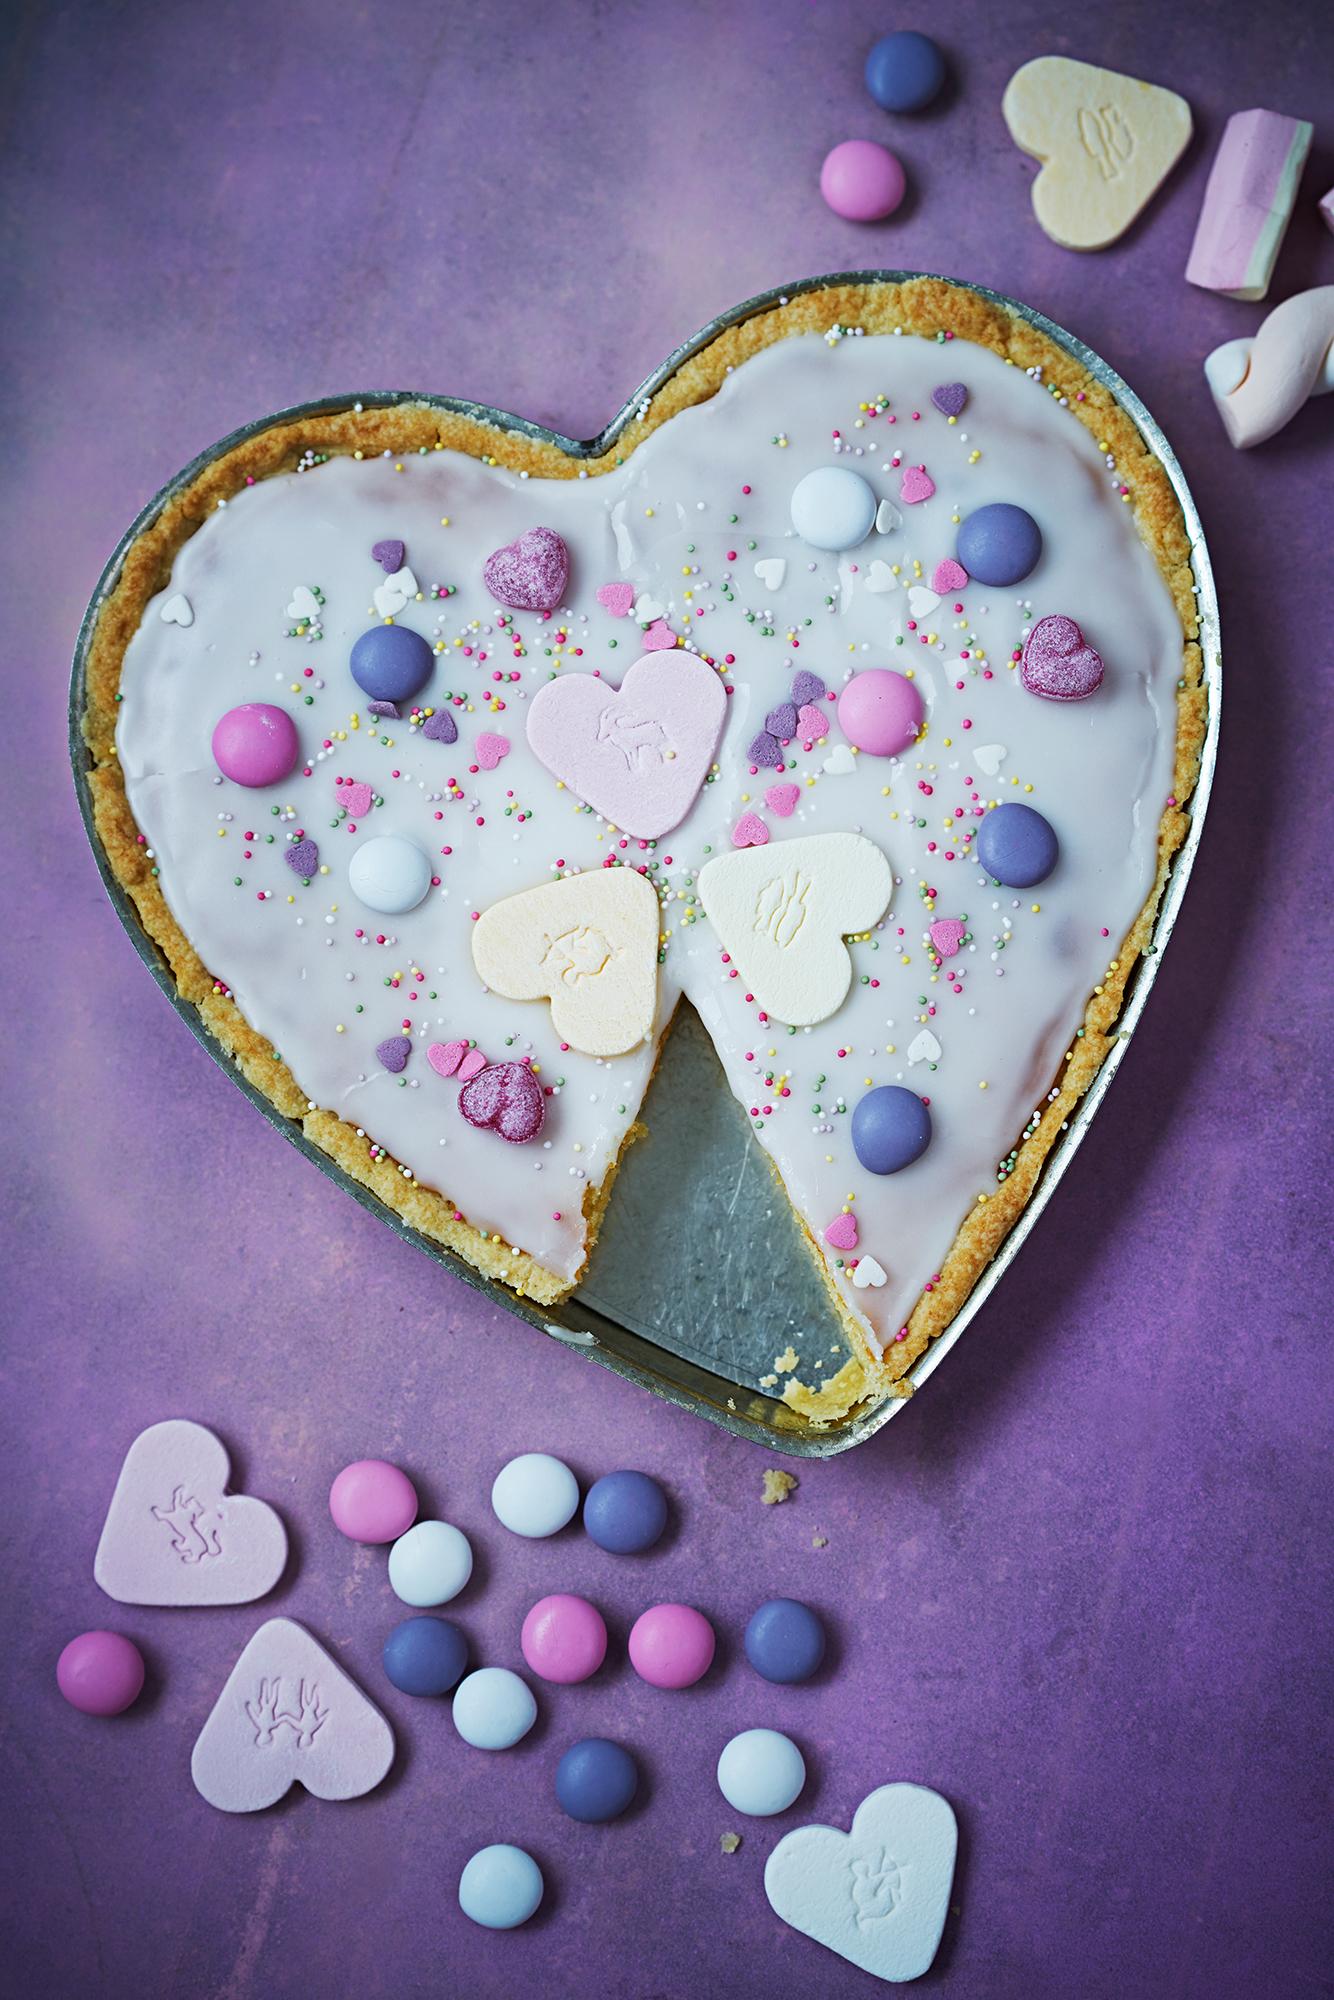 Expressen Baka med lakrits, choklad & godis